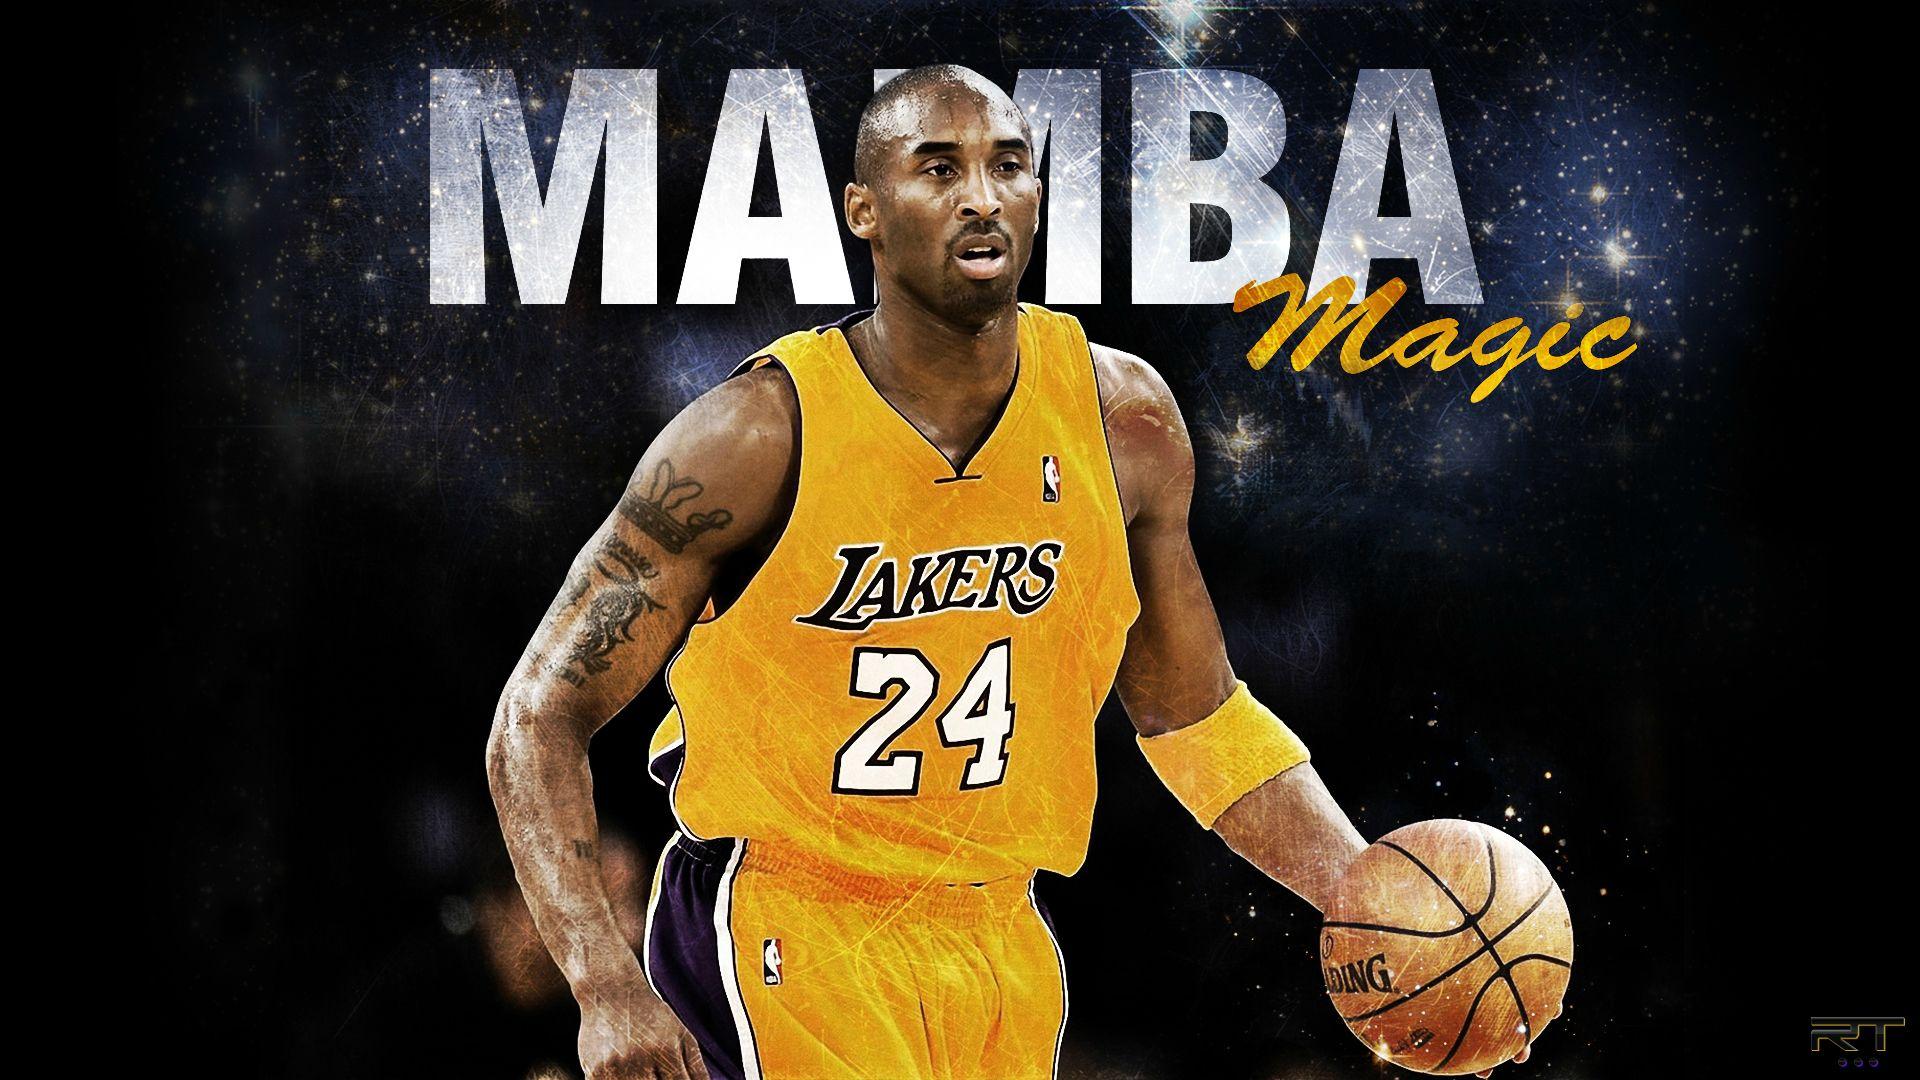 Kobe-Bryant-http-and-backgrounds-net-kobe-bryant-wallpaper-wp3607726